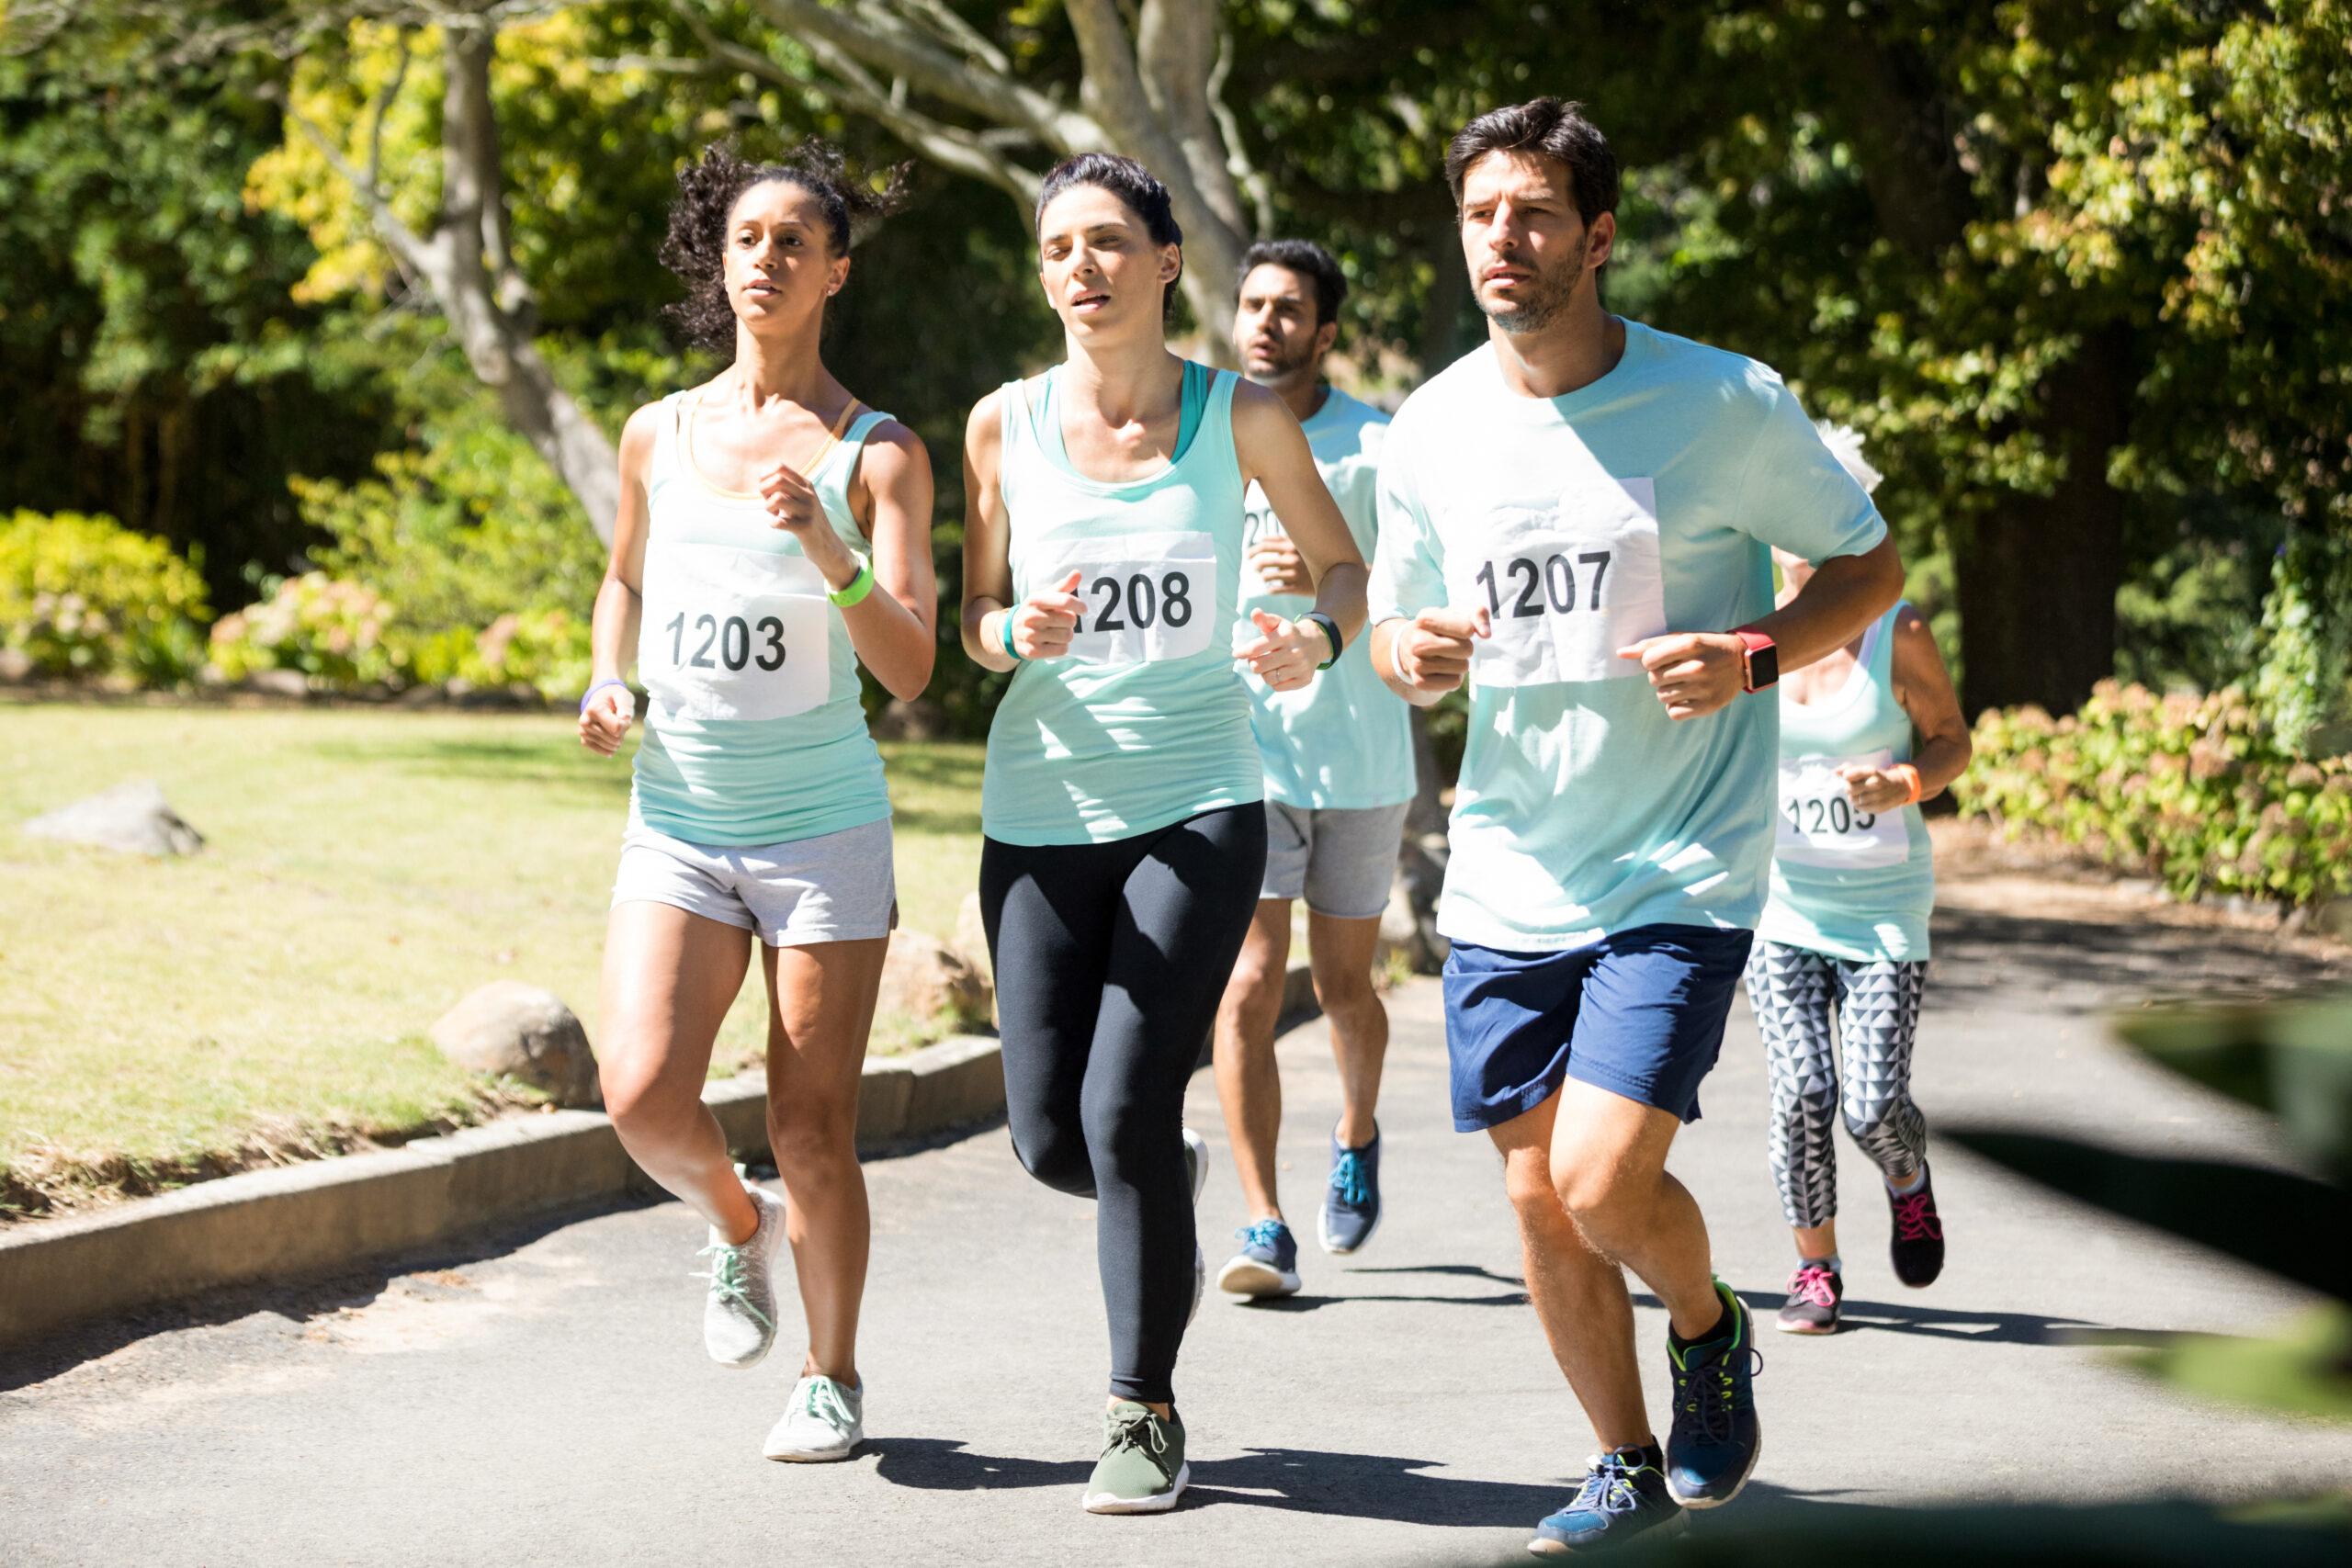 Determined marathon athletes running in the park